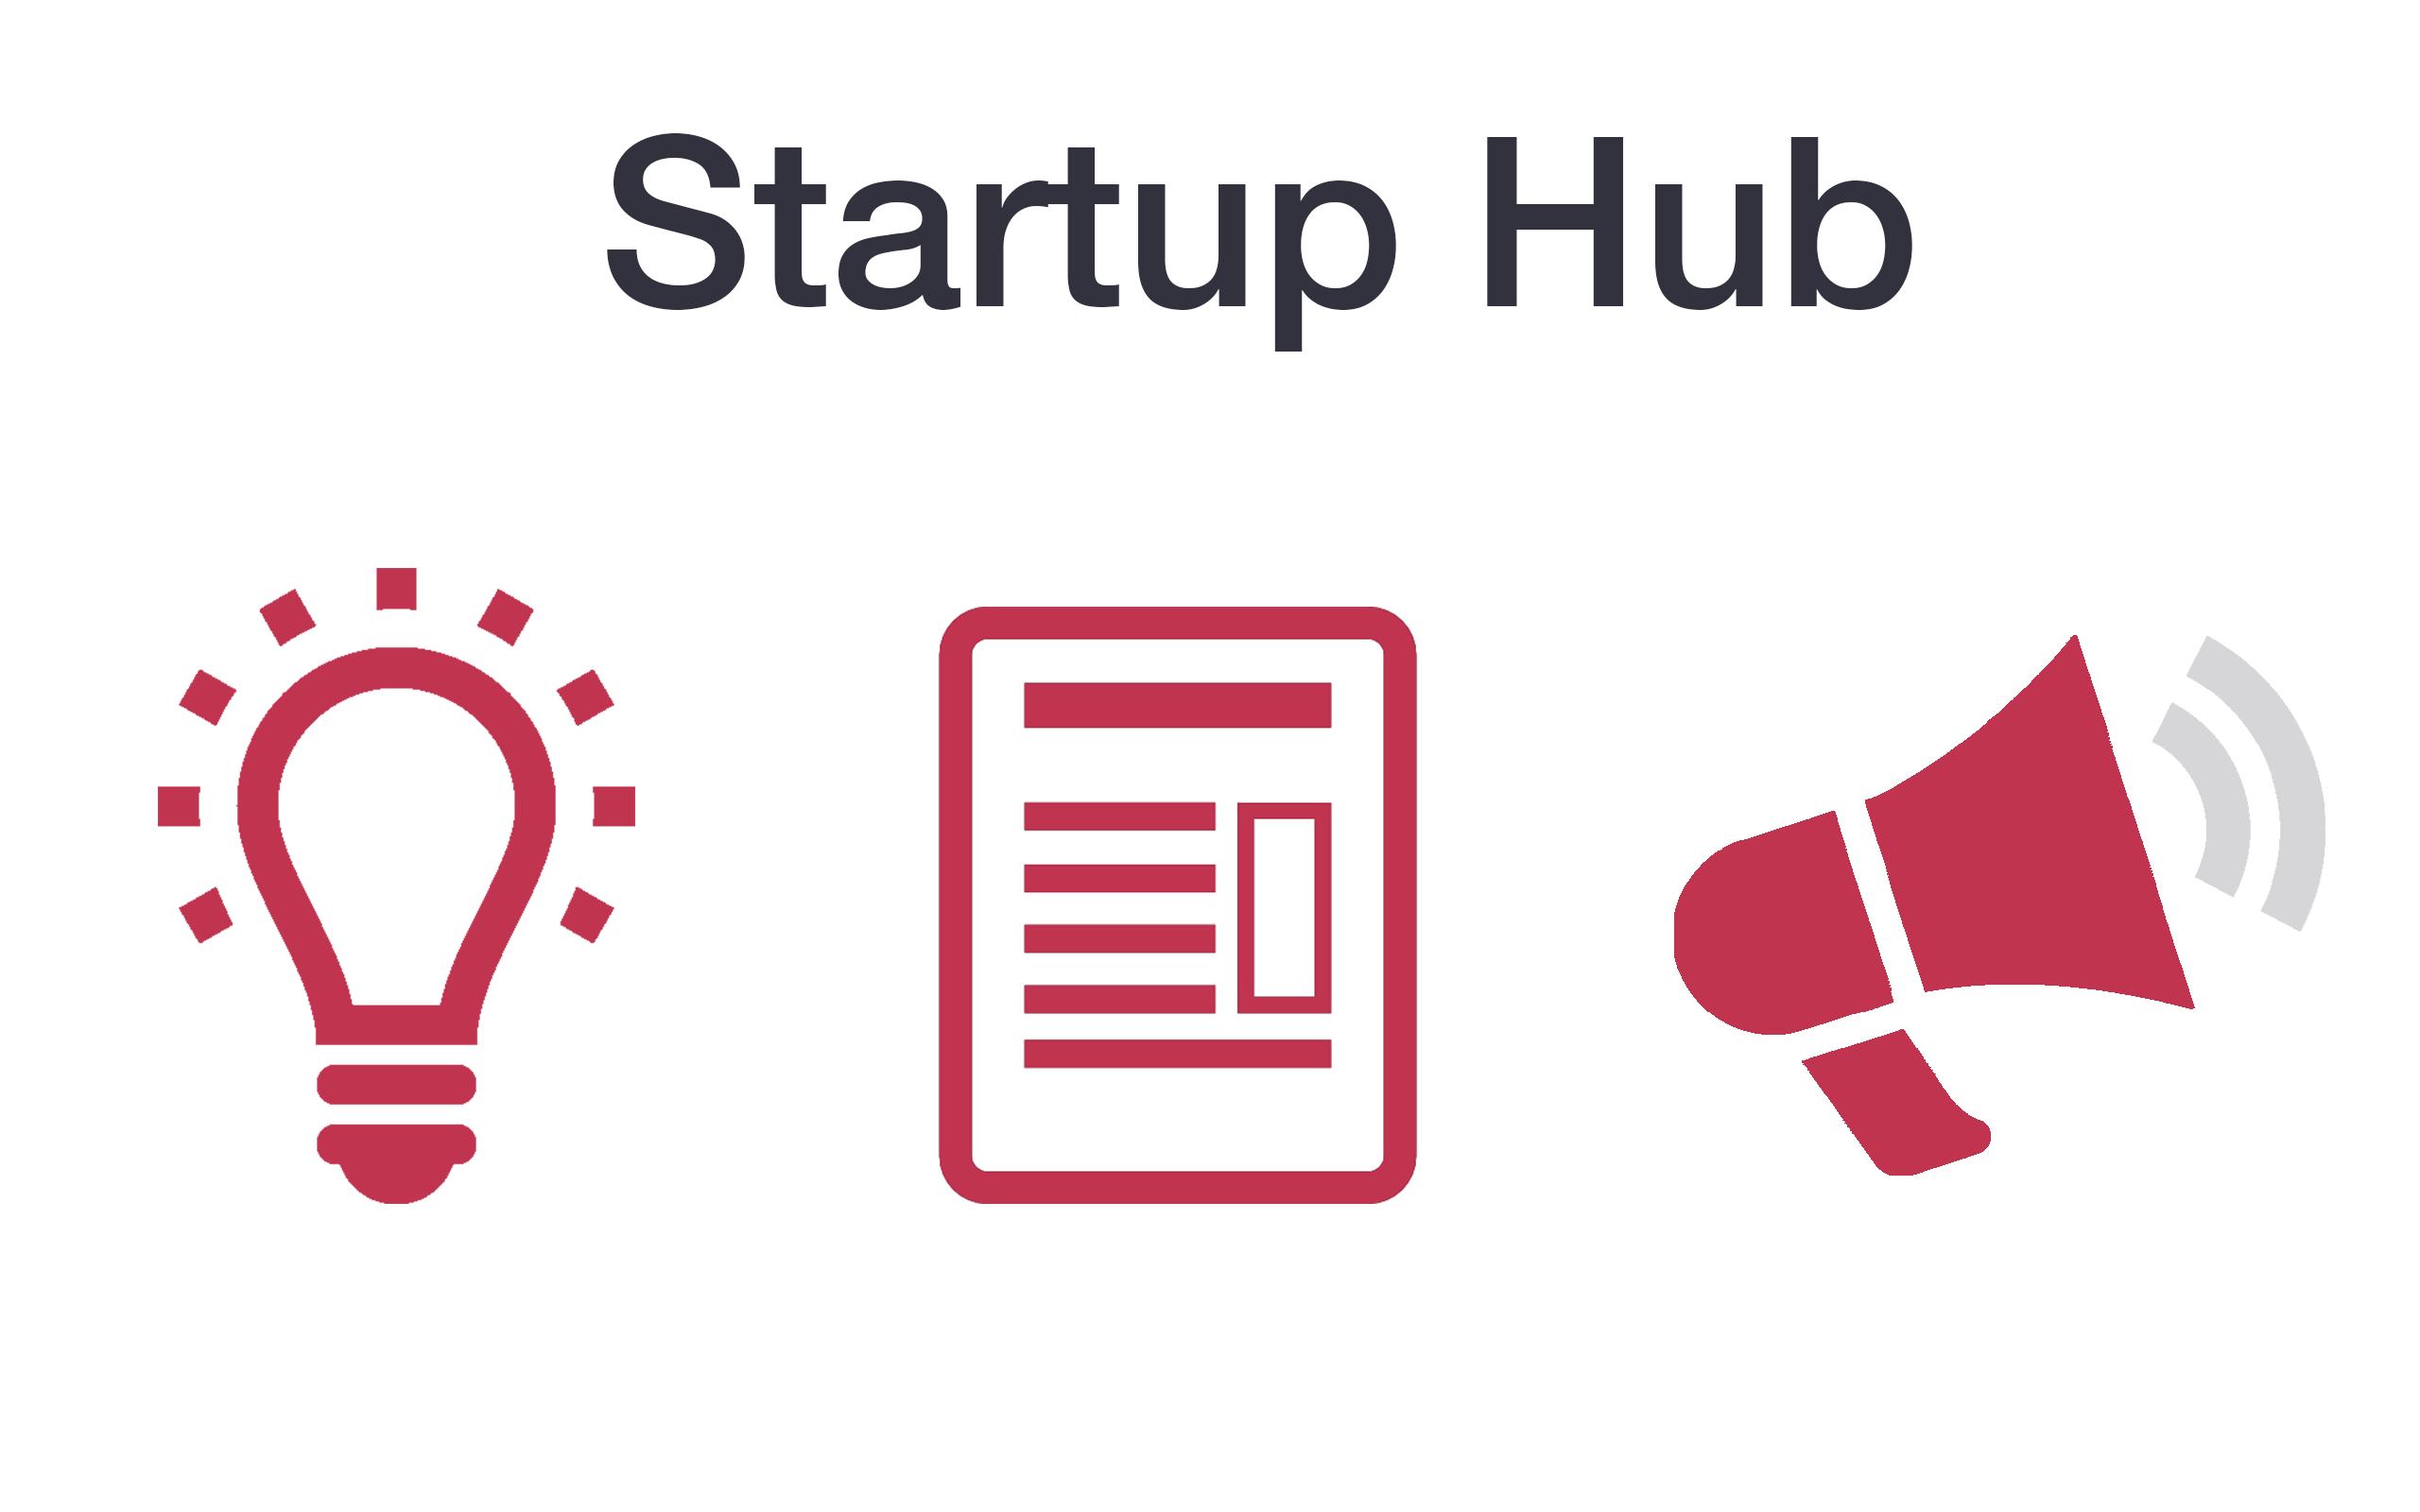 STARTUP HUB | MENA STARTUPS IN ONE STOP